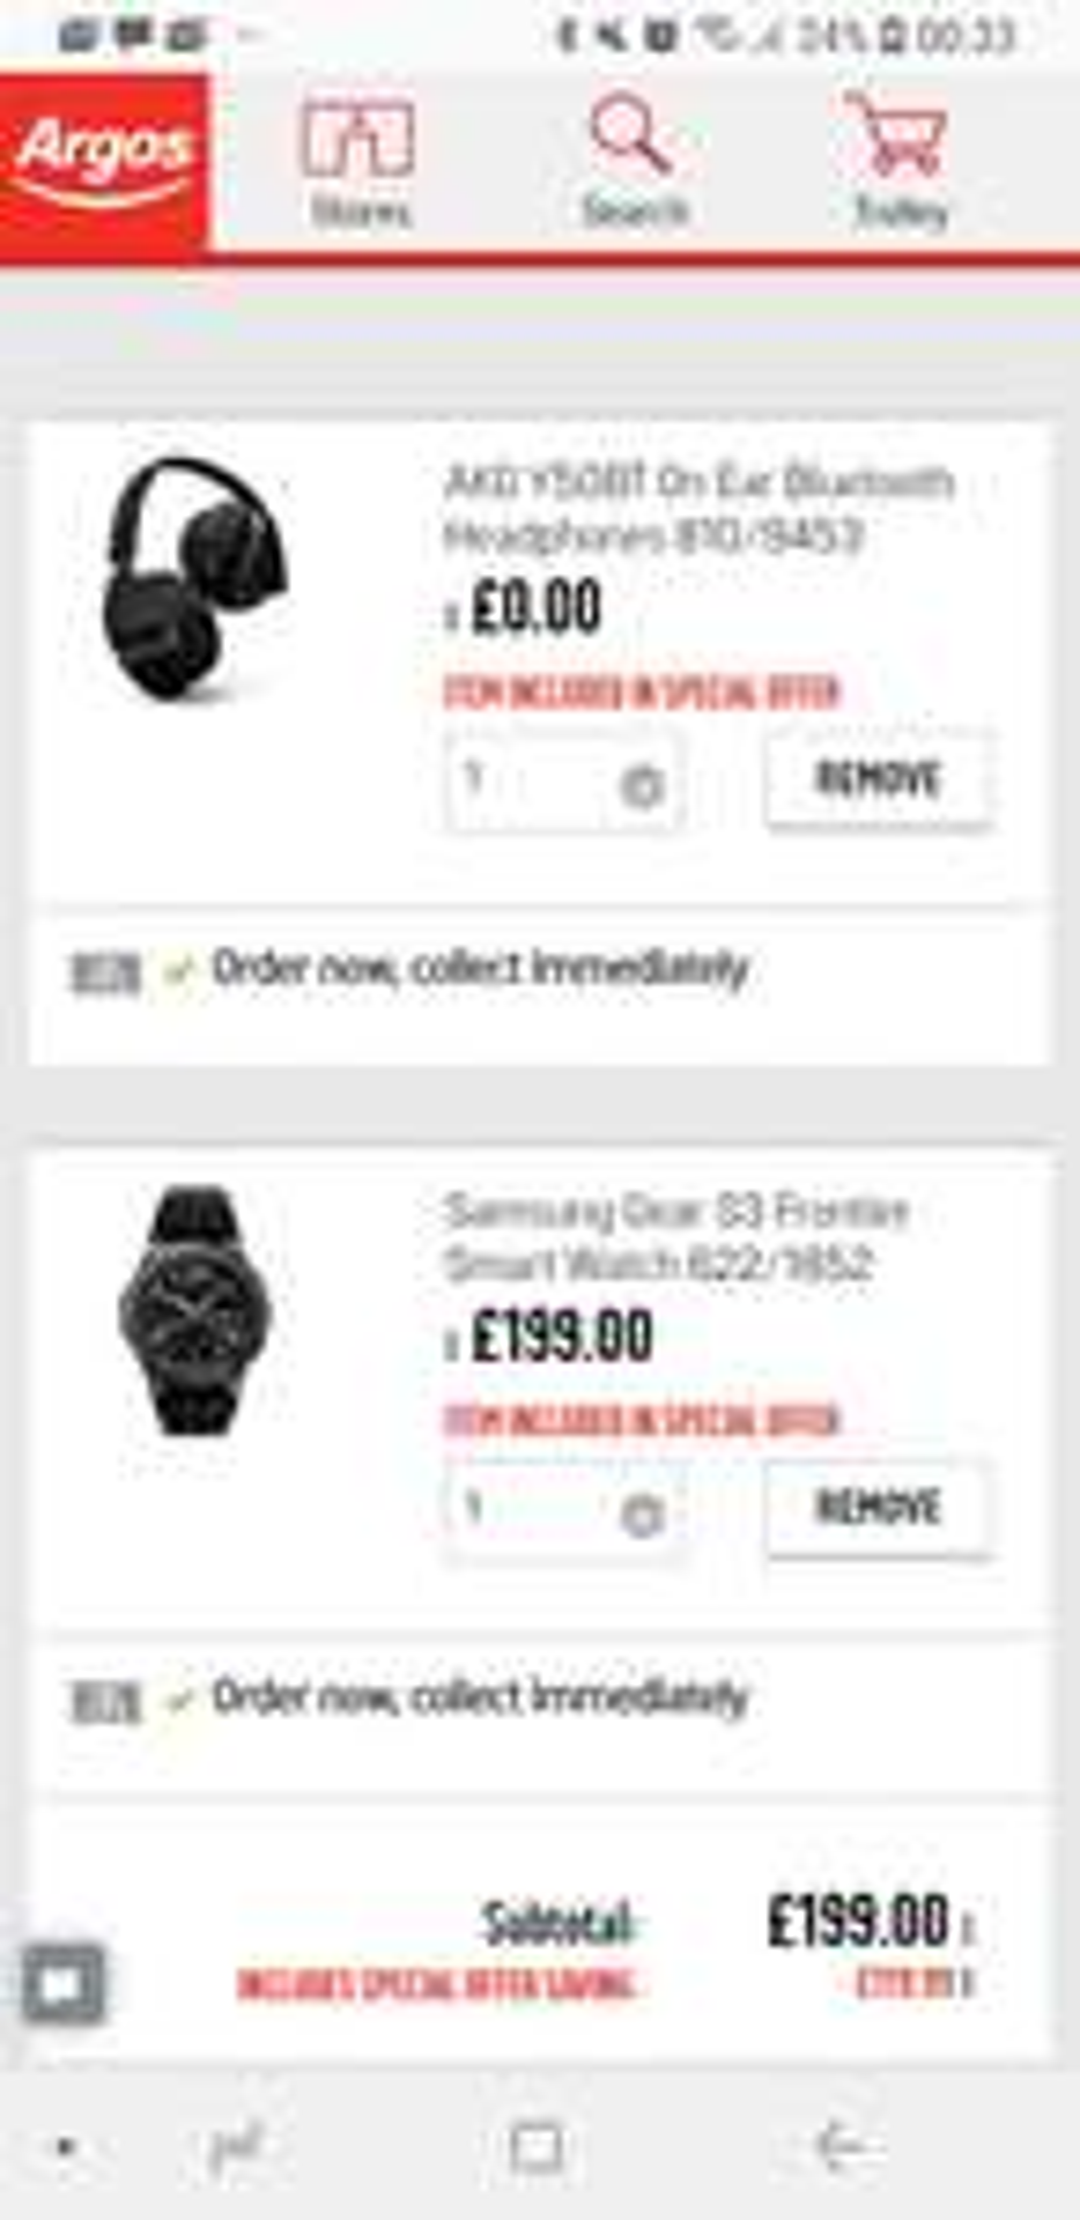 Samsung Gear S3 Frontier + Free AKG Y50BT Bluetooth Headphones at Argos £199